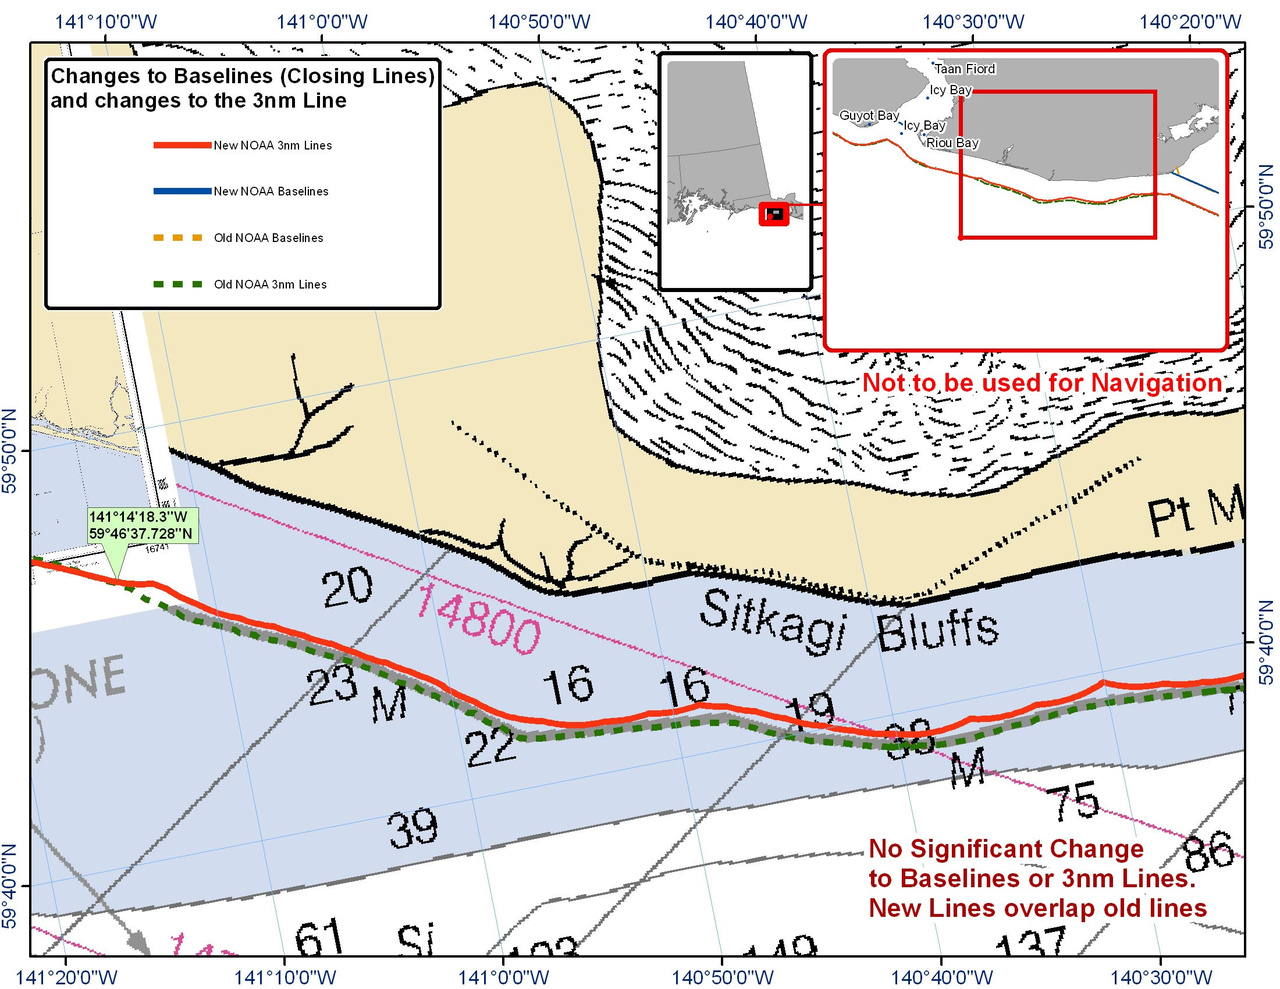 Chart for Sitkagi Bluffs